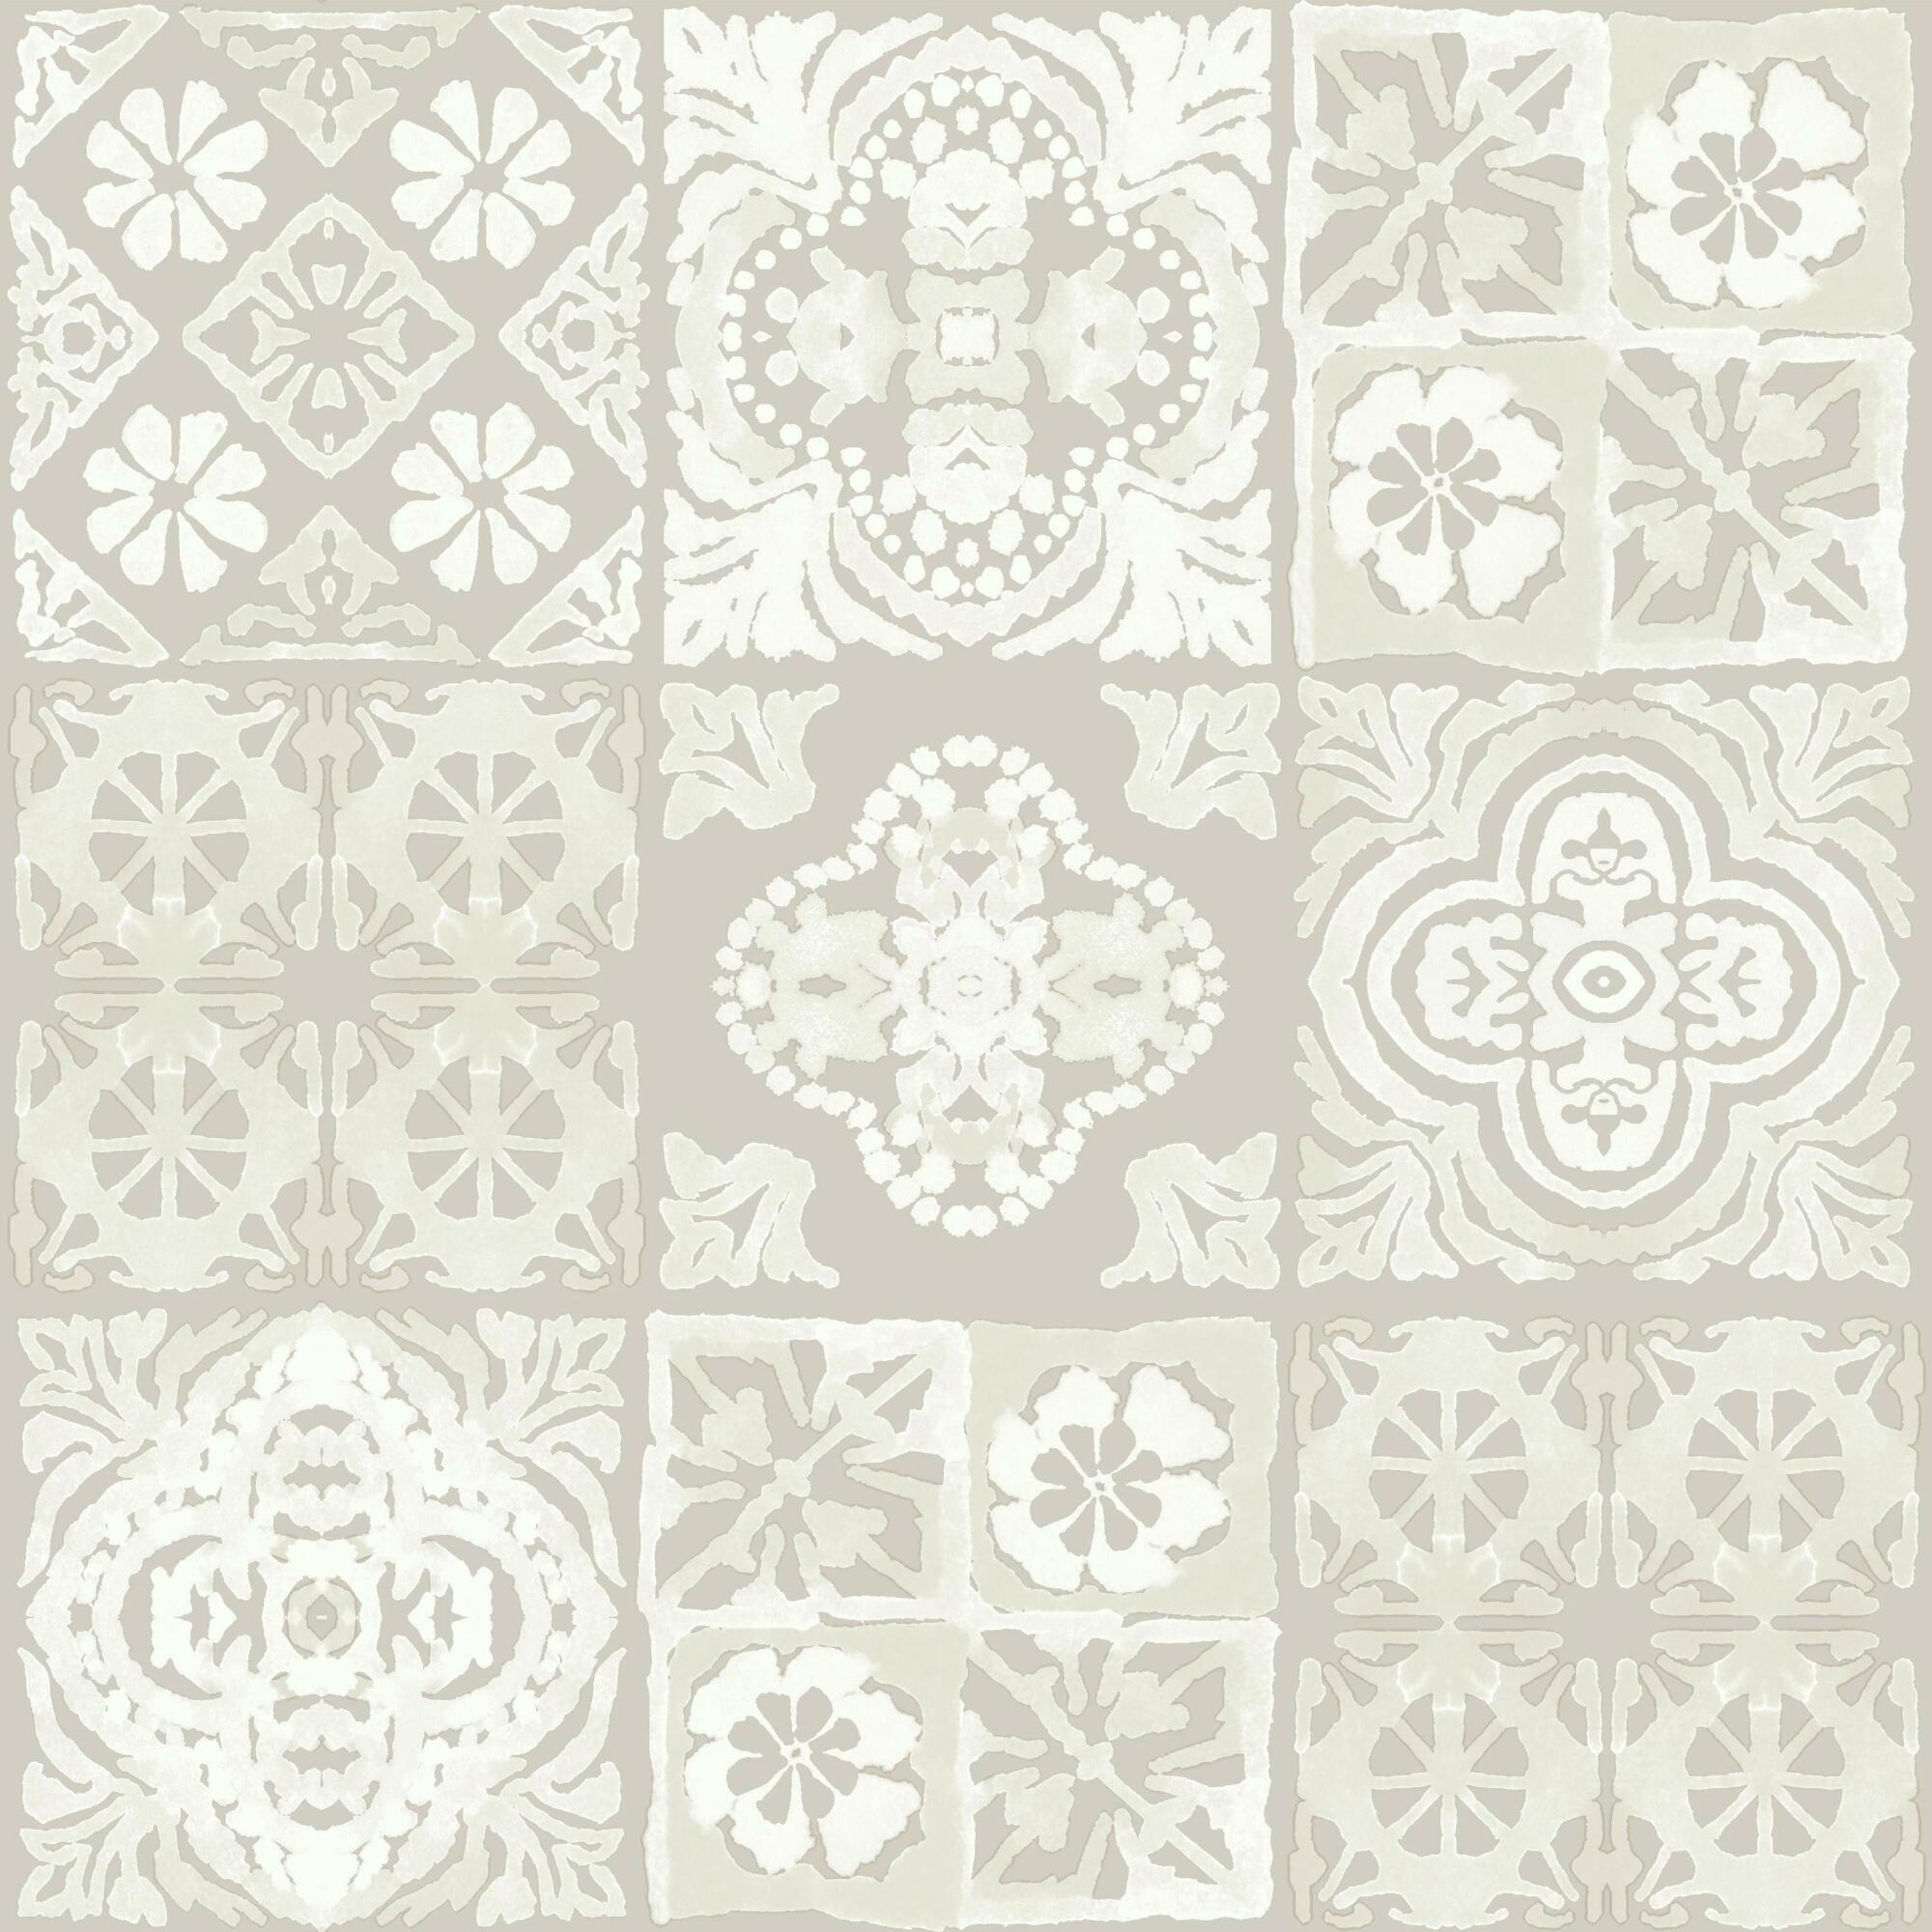 Tan Mosaic Tile Peel And Stick Wallpaper Marrakesh Tile Peel And Stick Wallpaper Wallpaper